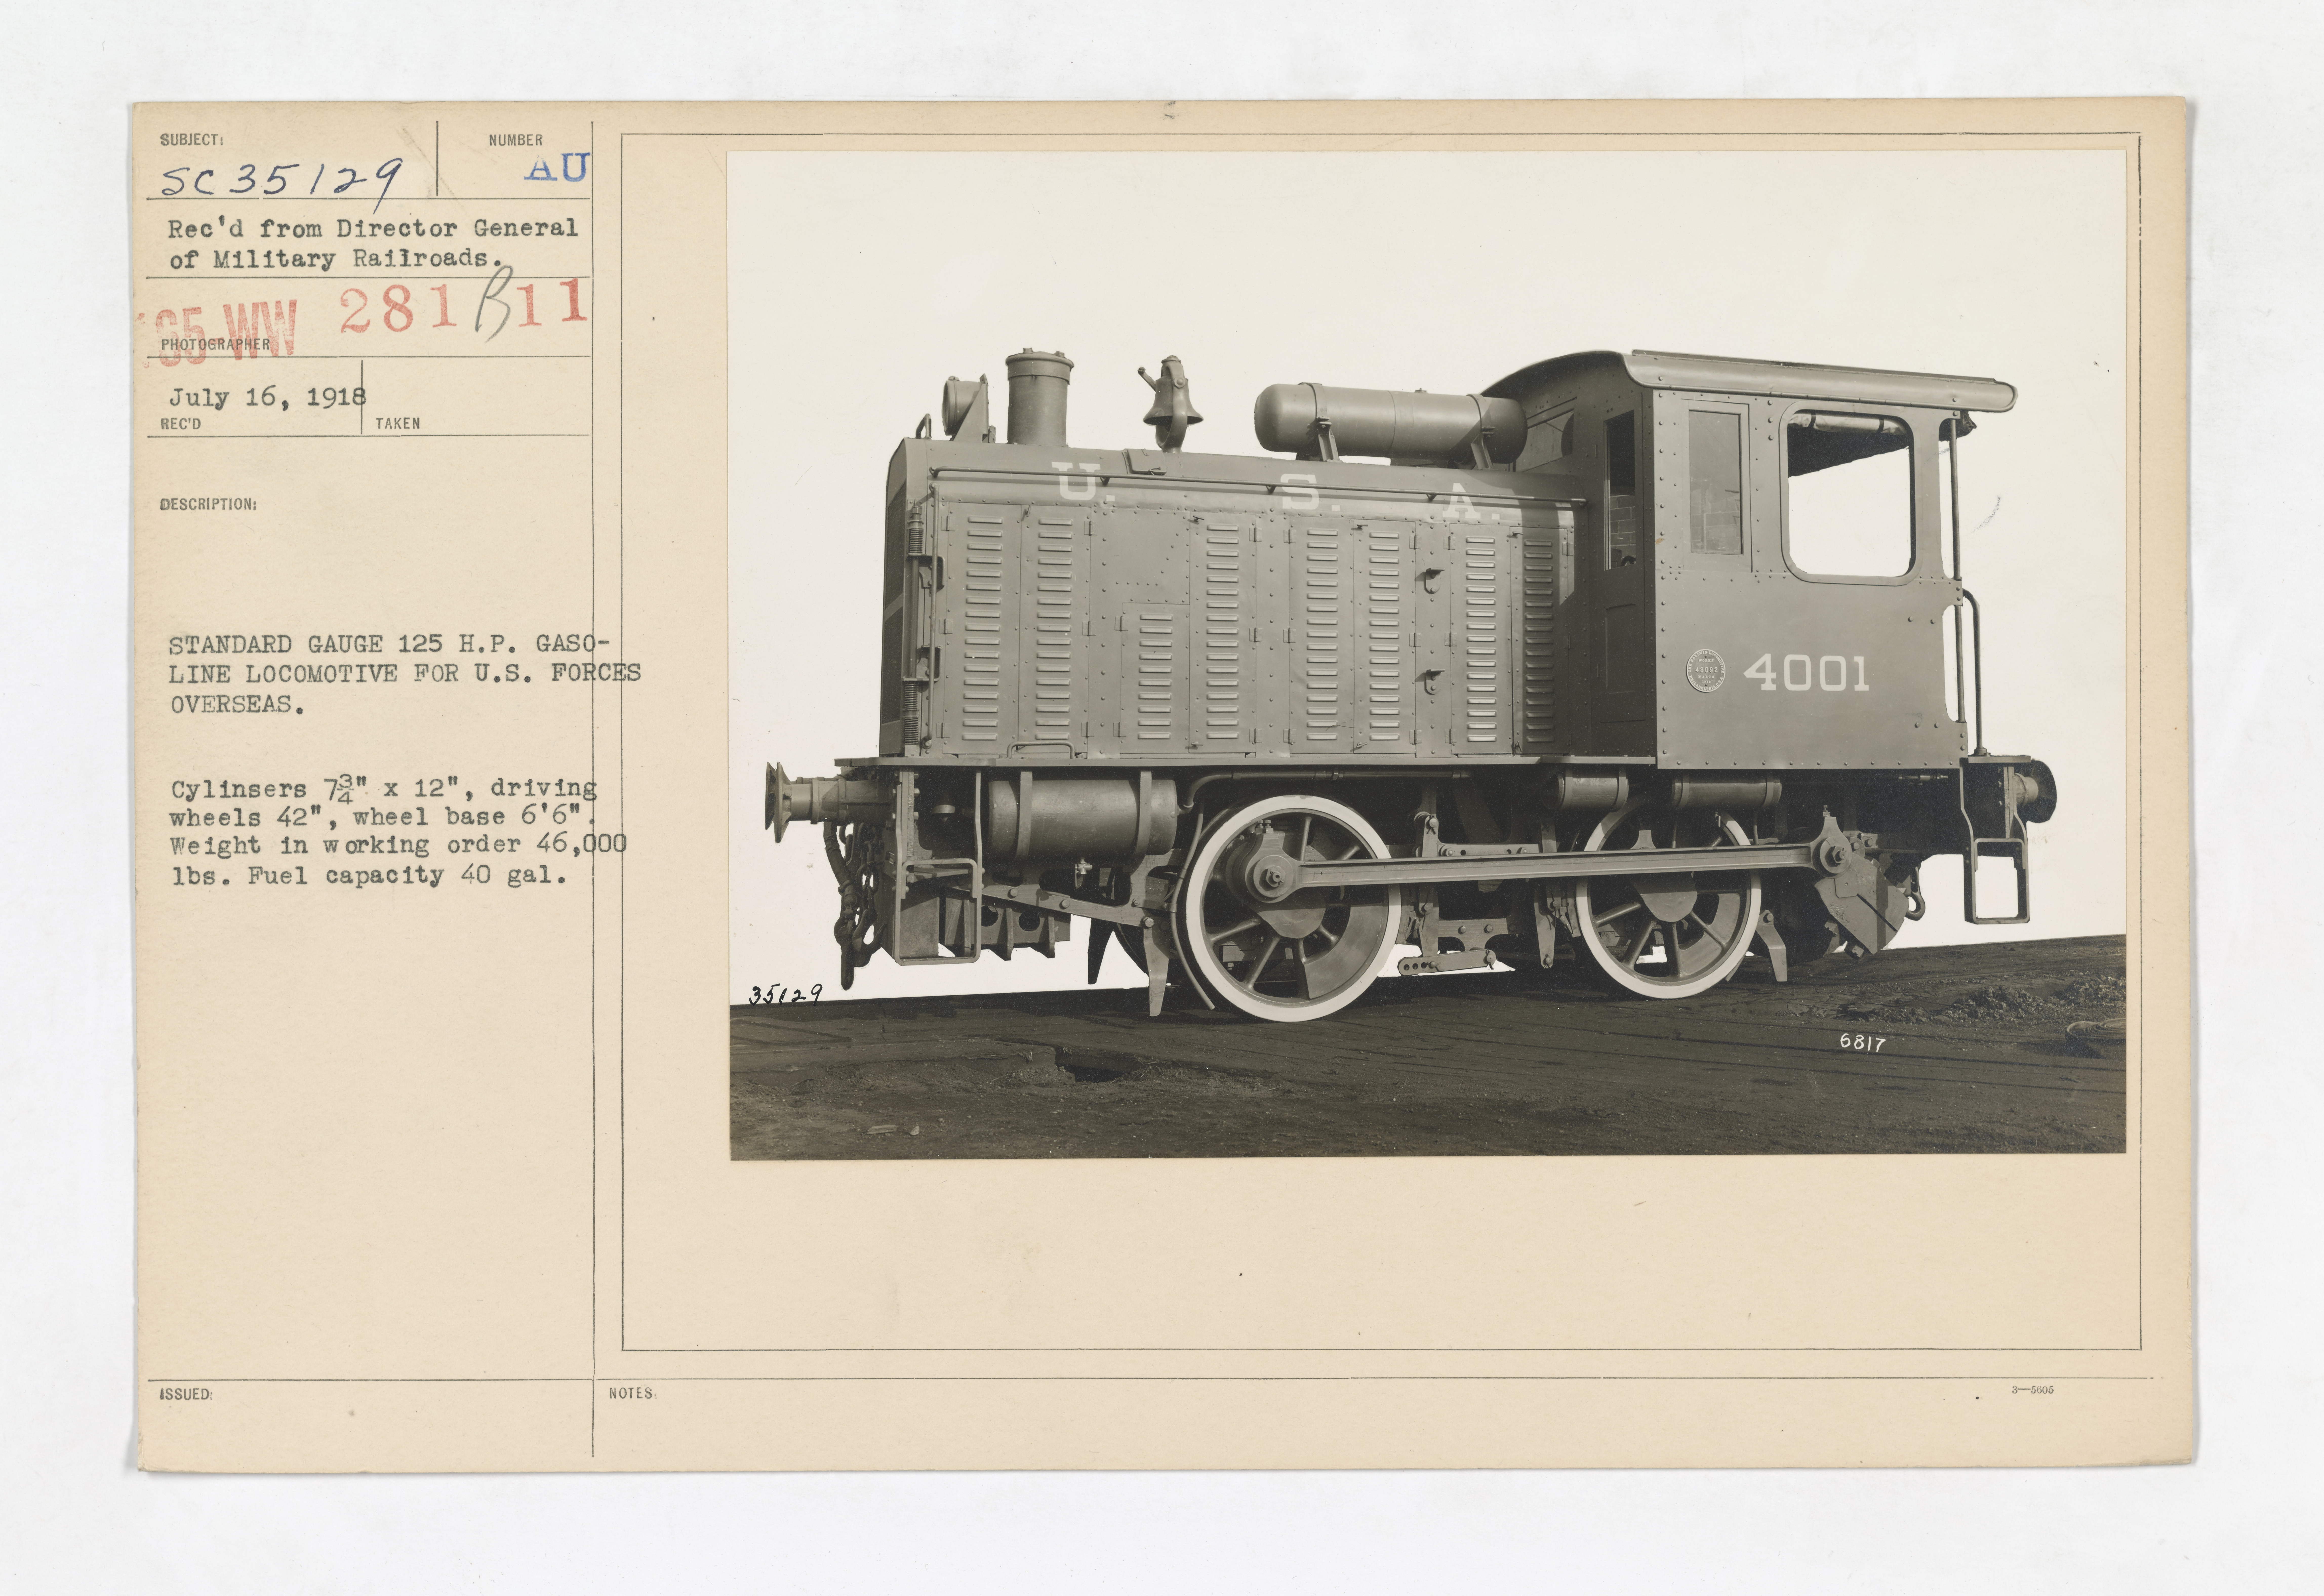 Military Administration - Transportation - Rail - STANDARD GAUGE 125 H.P. GASOLINE LOCOMOTIVE FOR U.S. FORCES OVERSEAS